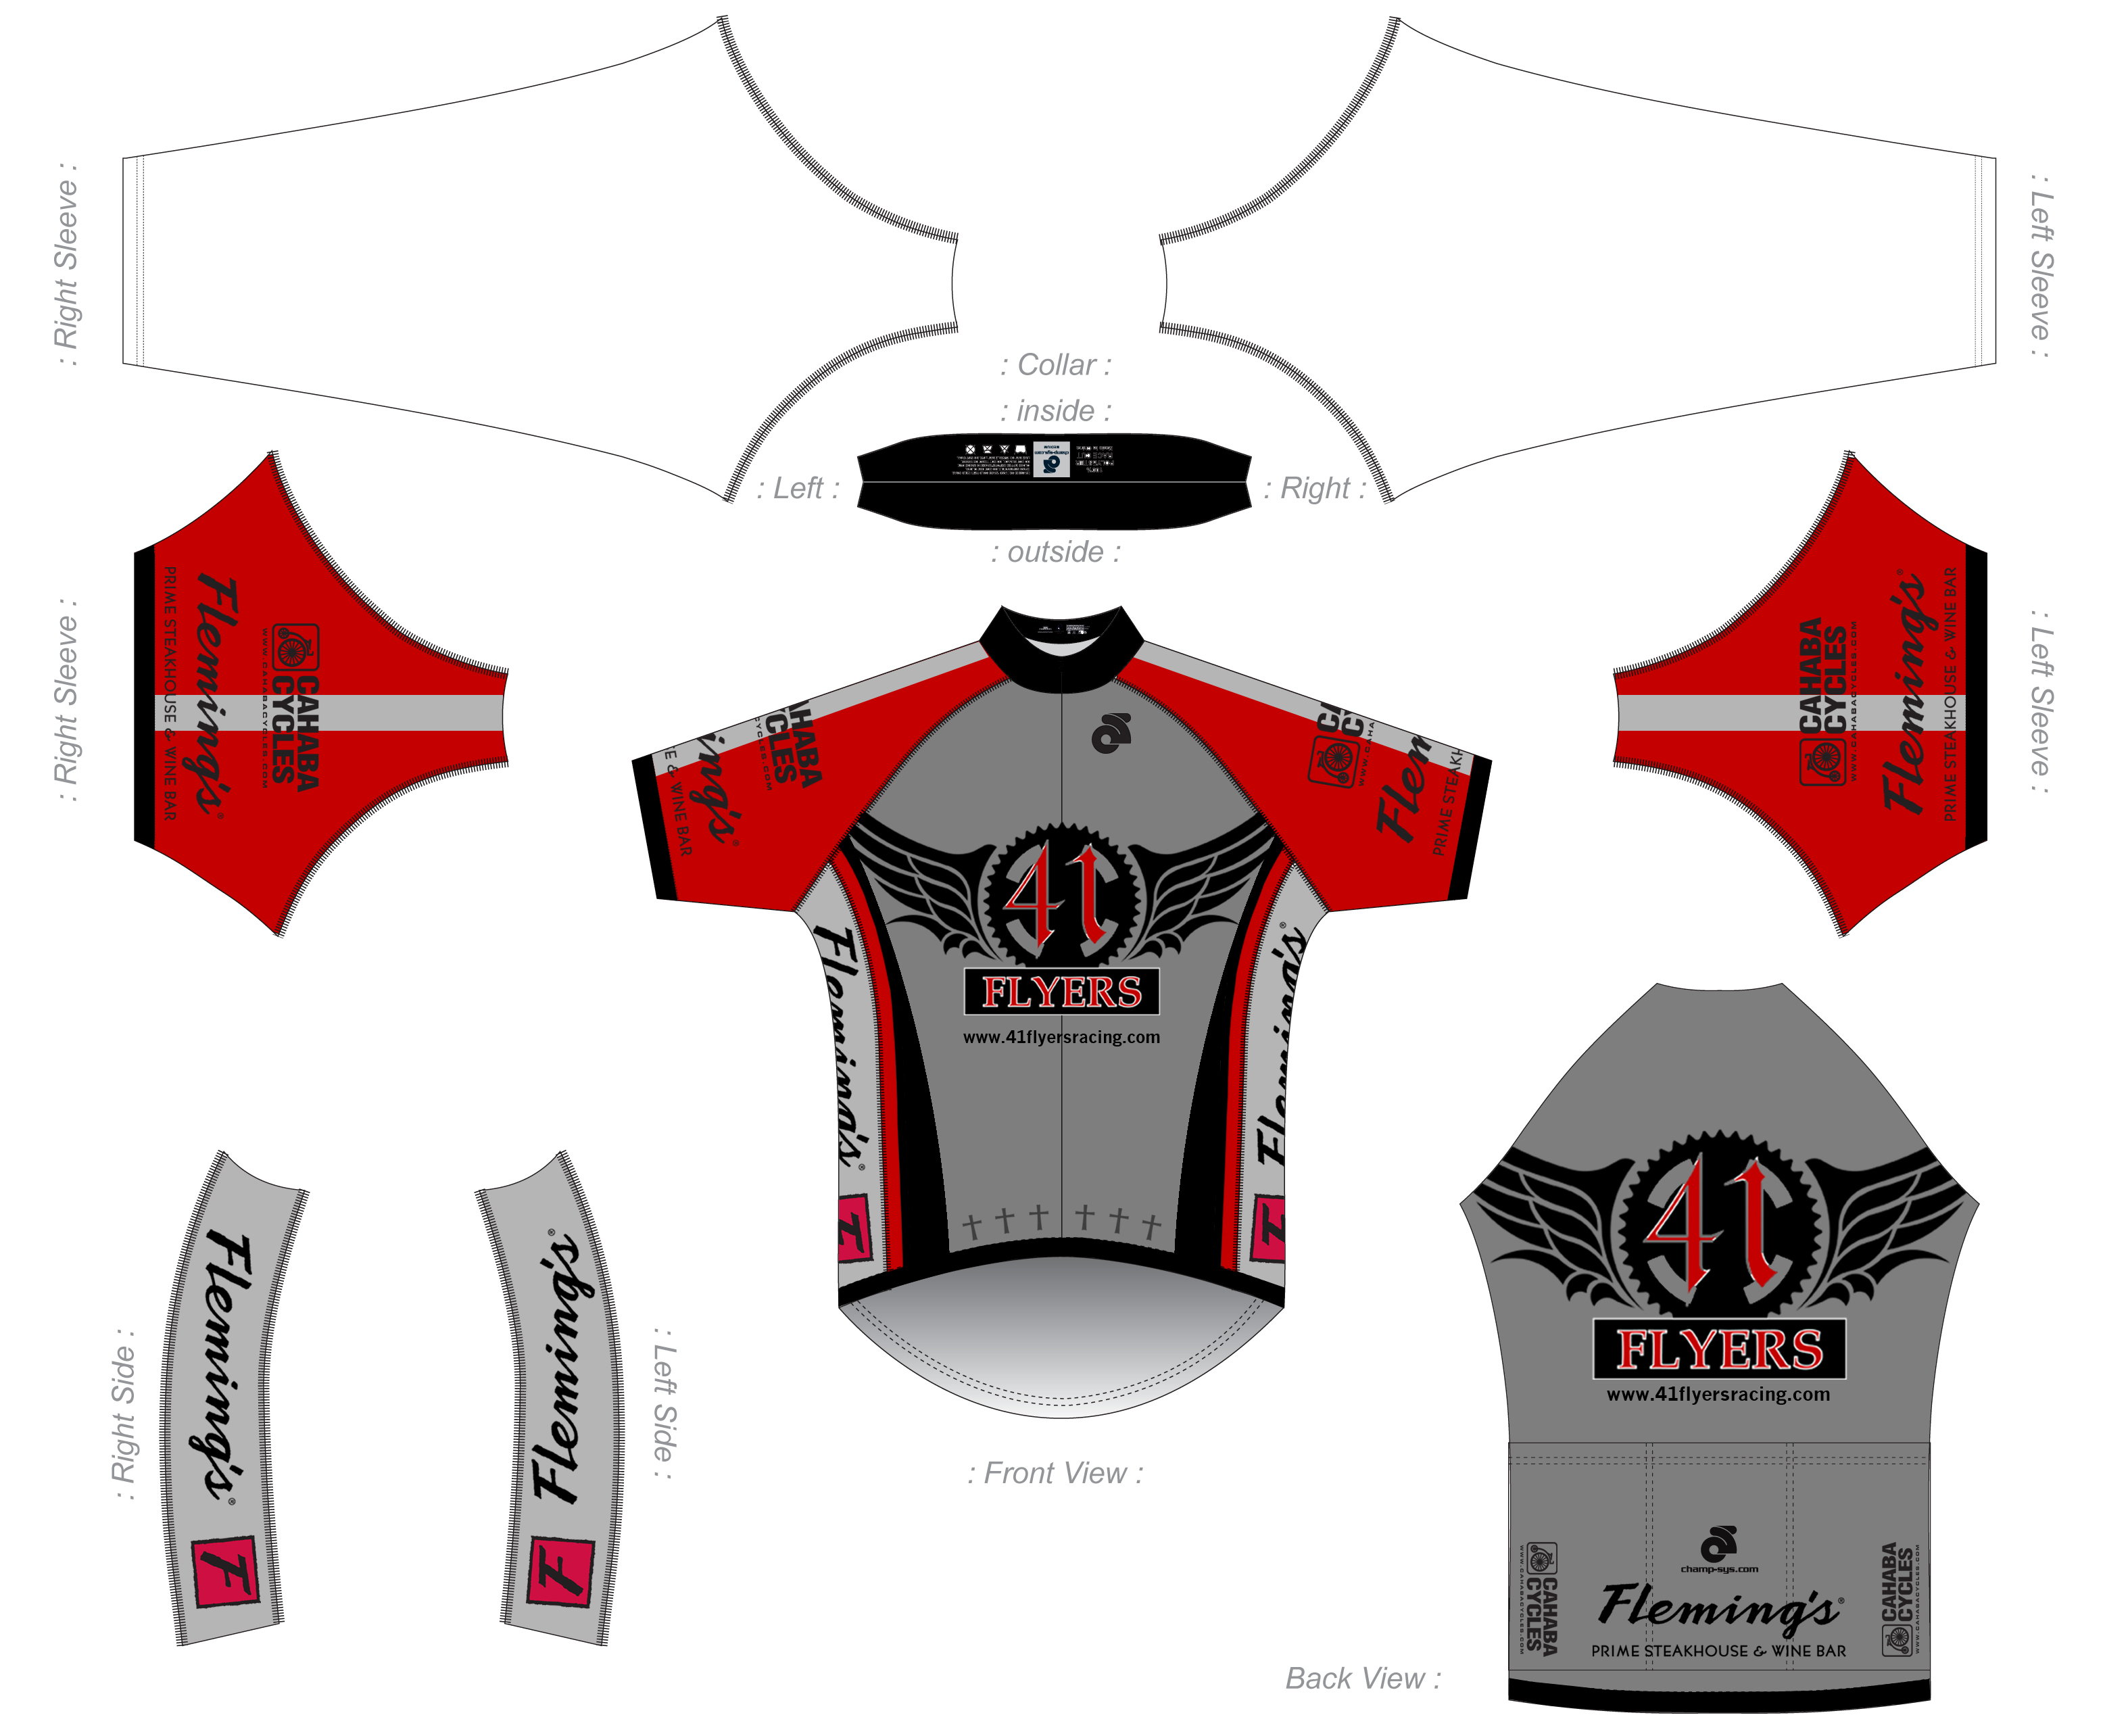 Design t shirt online template - Ulser 41flyersracing